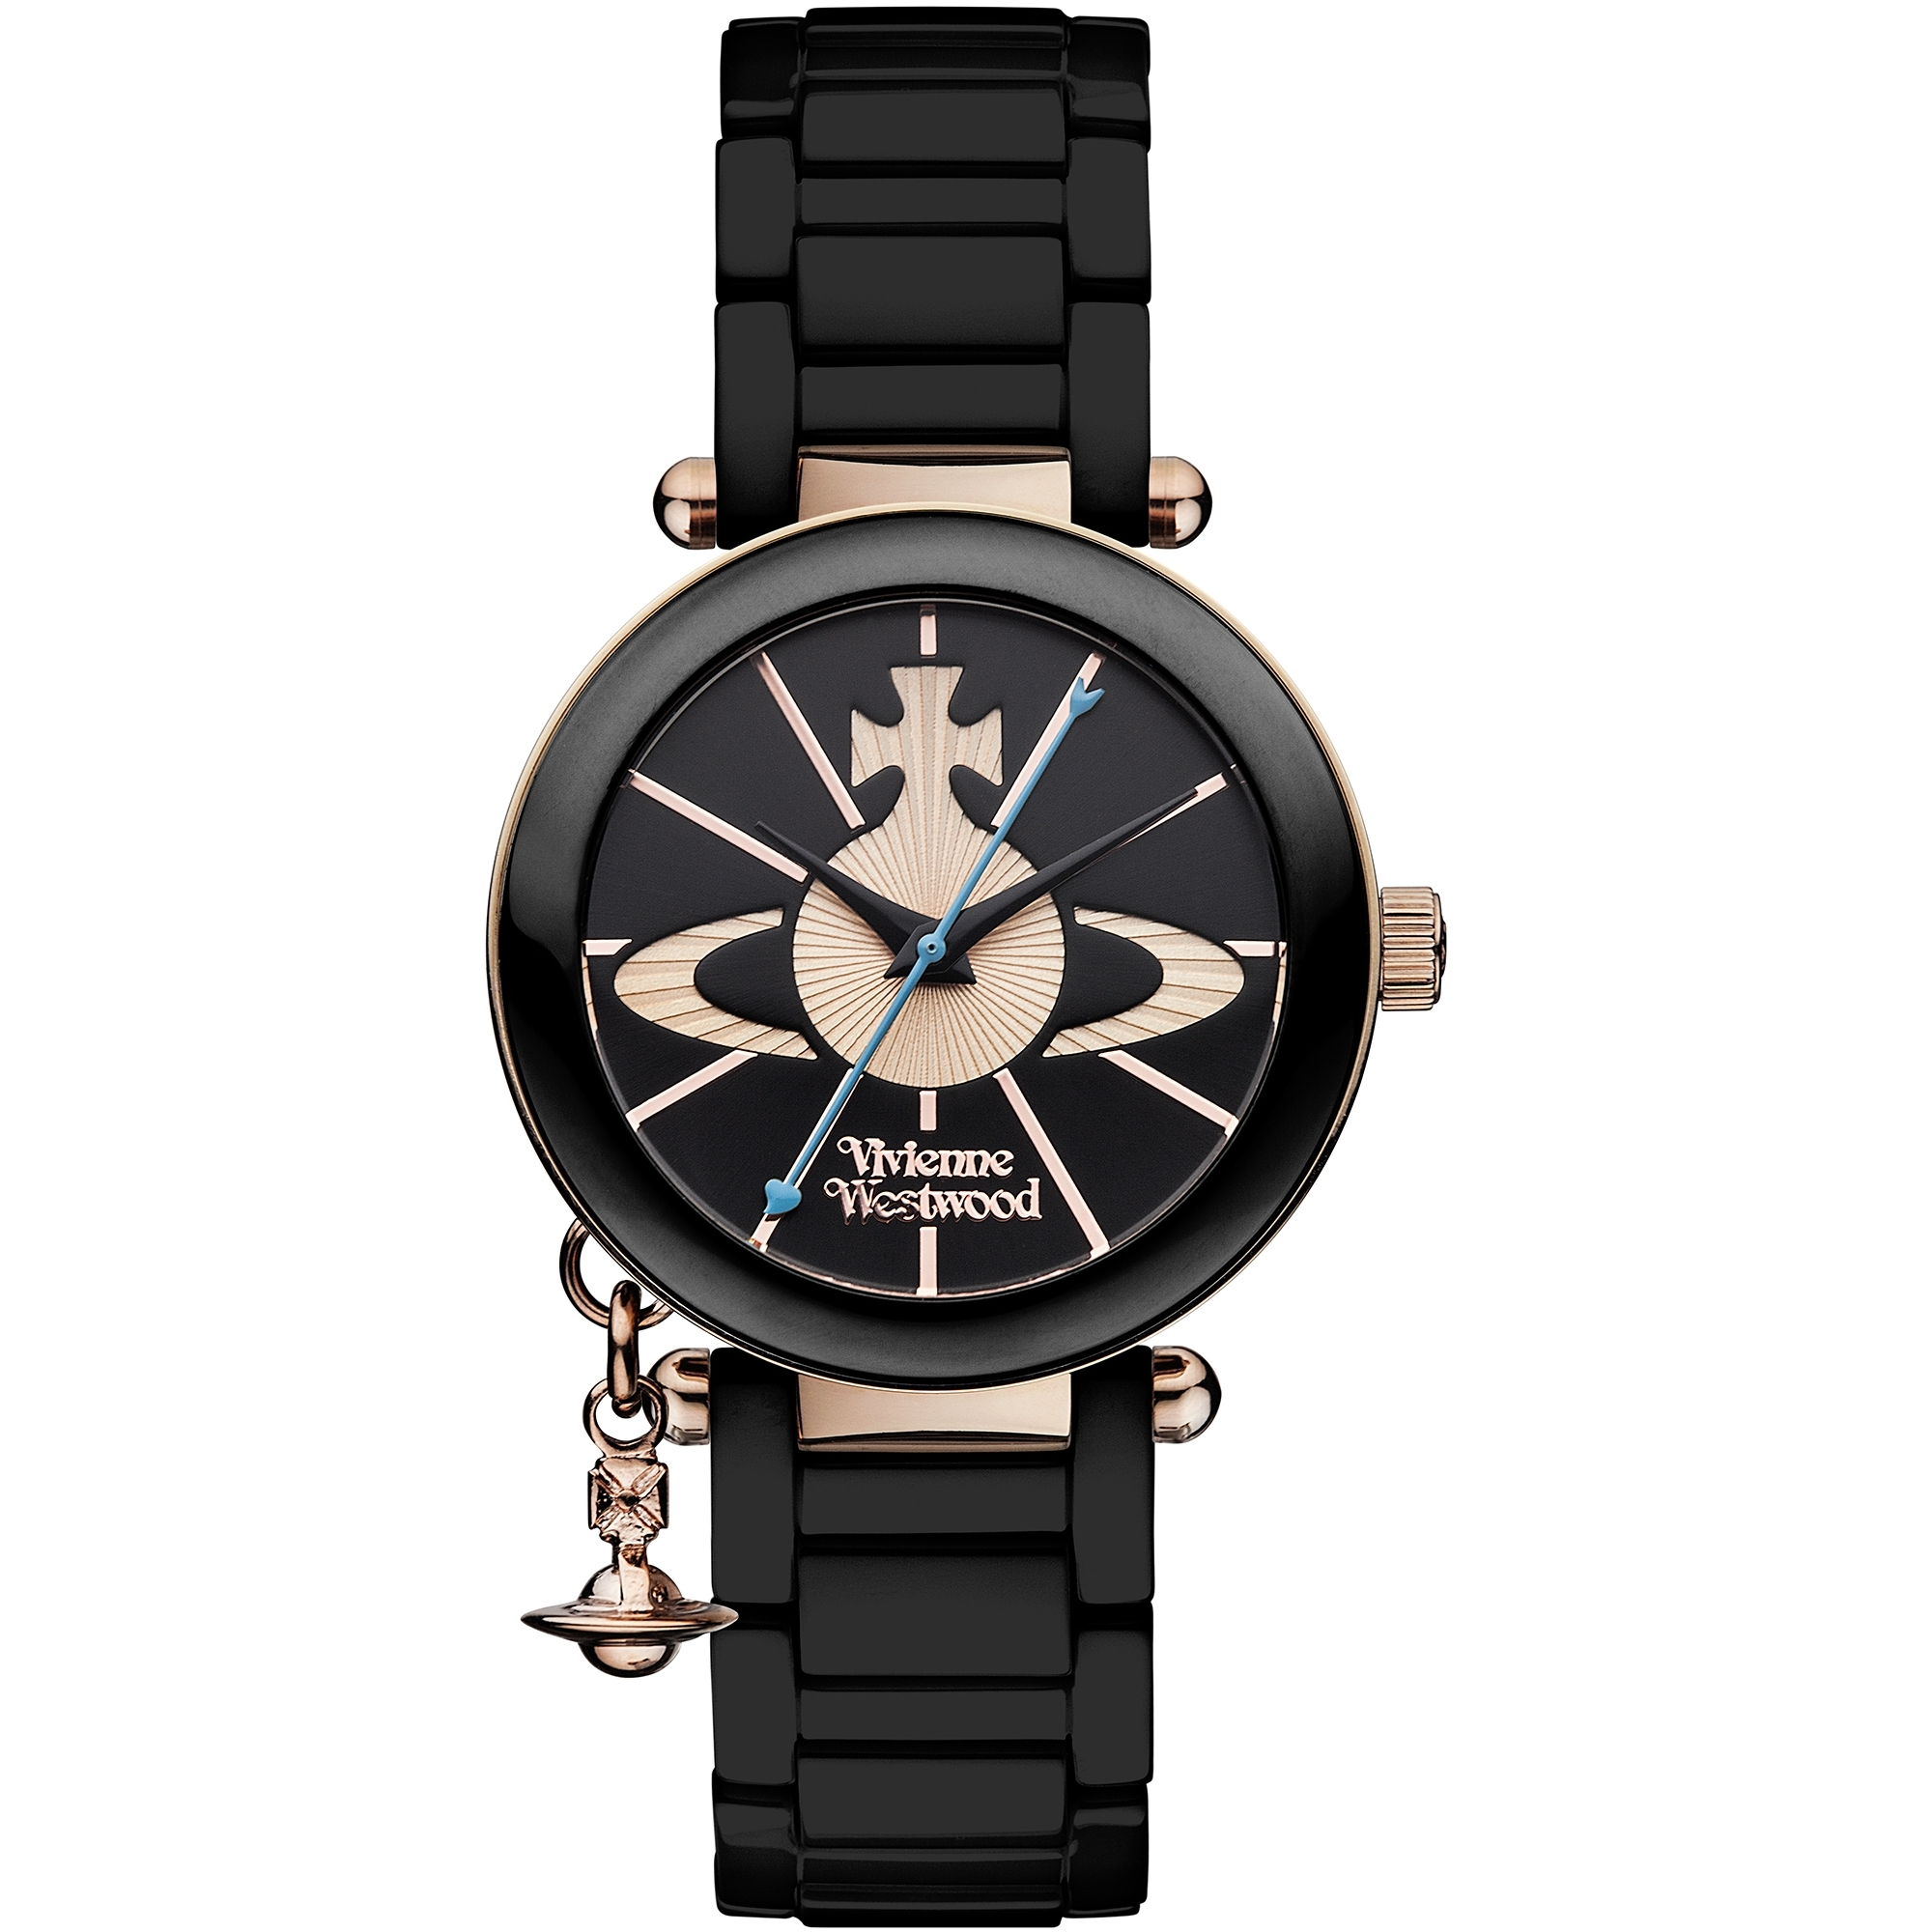 c8ab108d7f2 Ladies Vivienne Westwood Kensington Watch (VV067RSBK) | WatchShop.com™